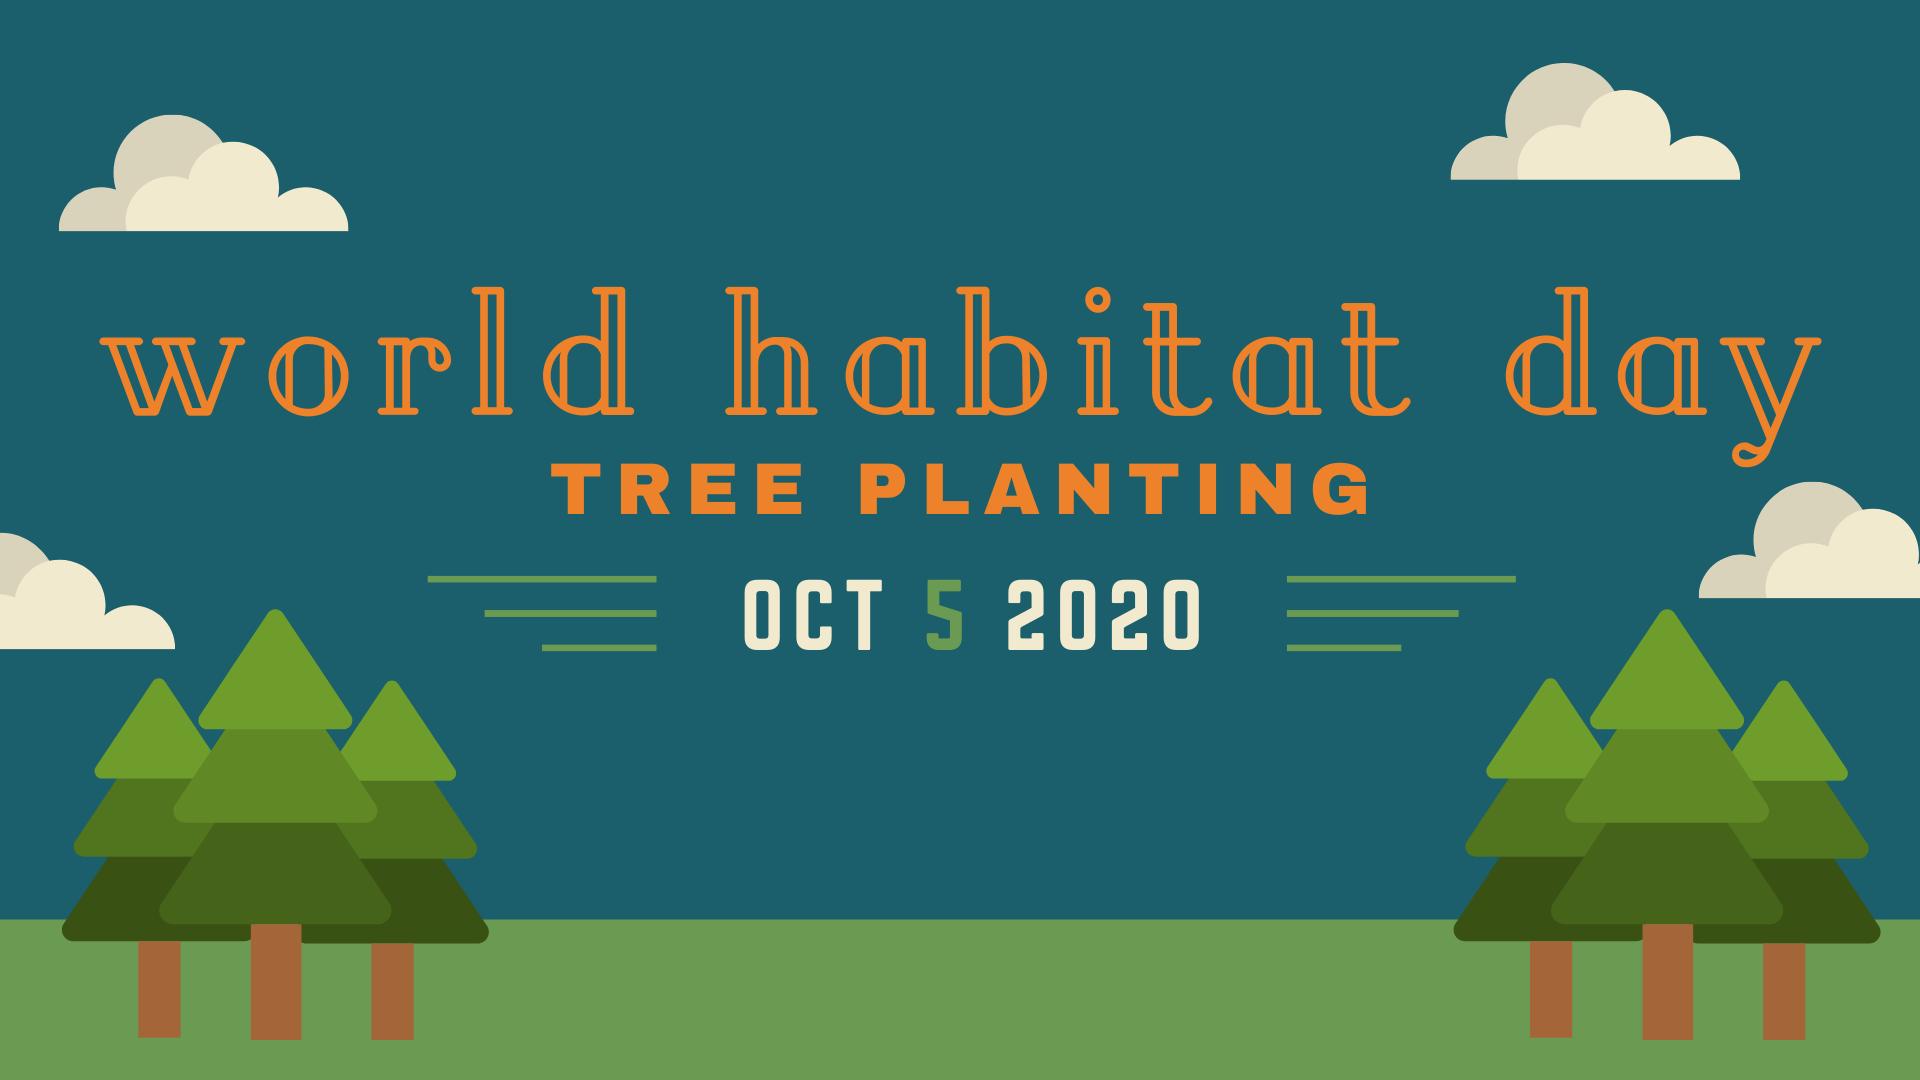 World Habitat Day 2020 Tree Planting